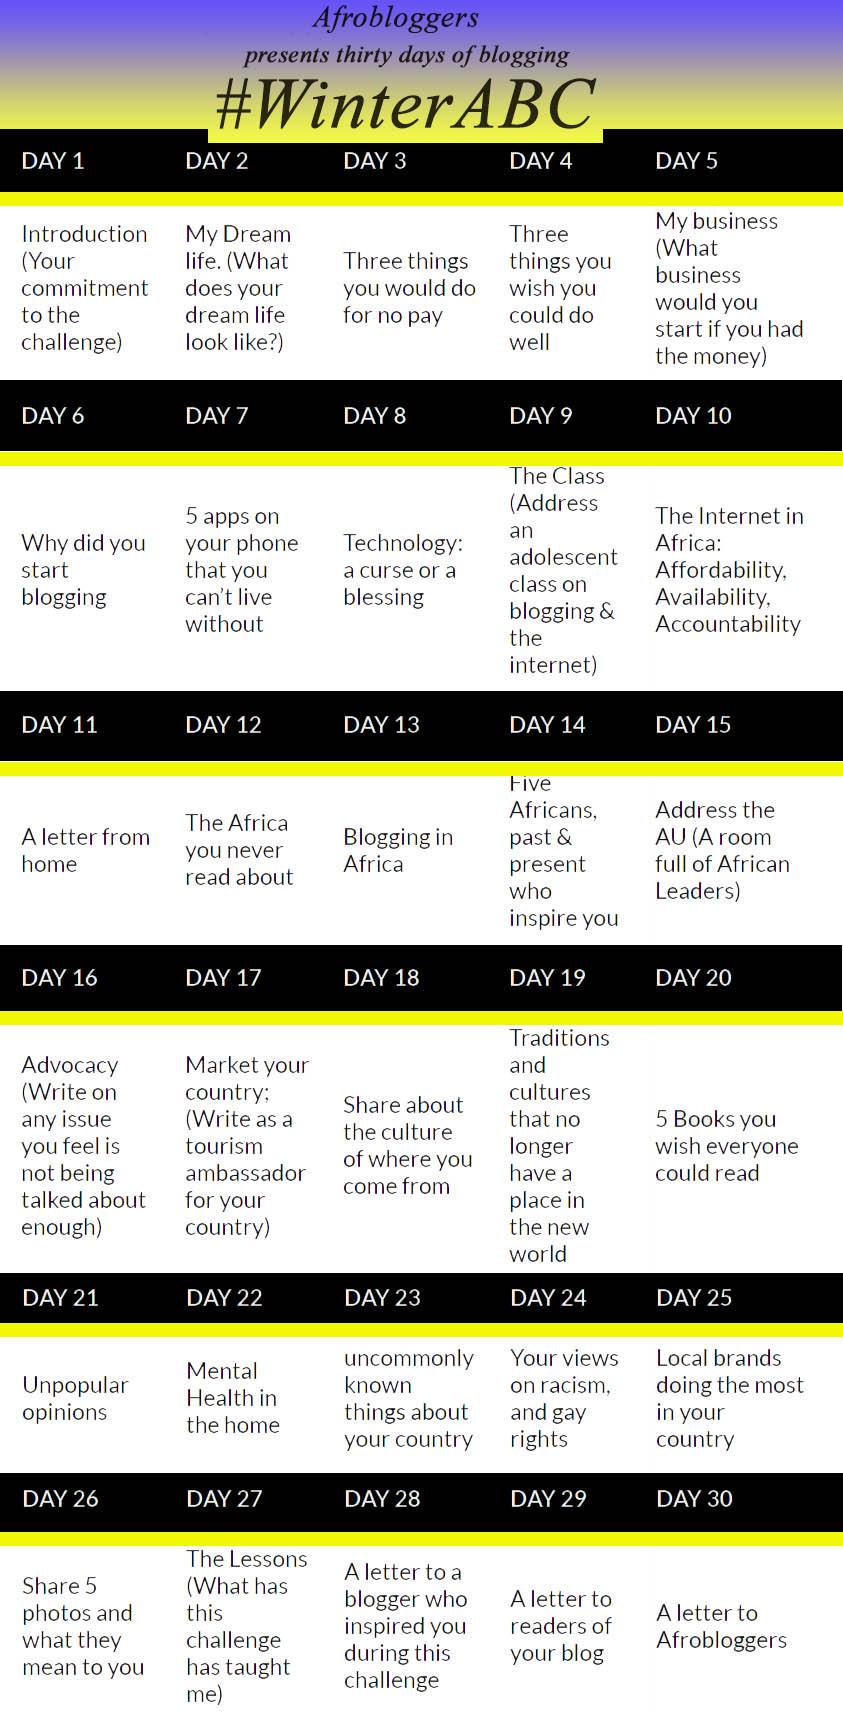 Afrobloggers #WinterABC